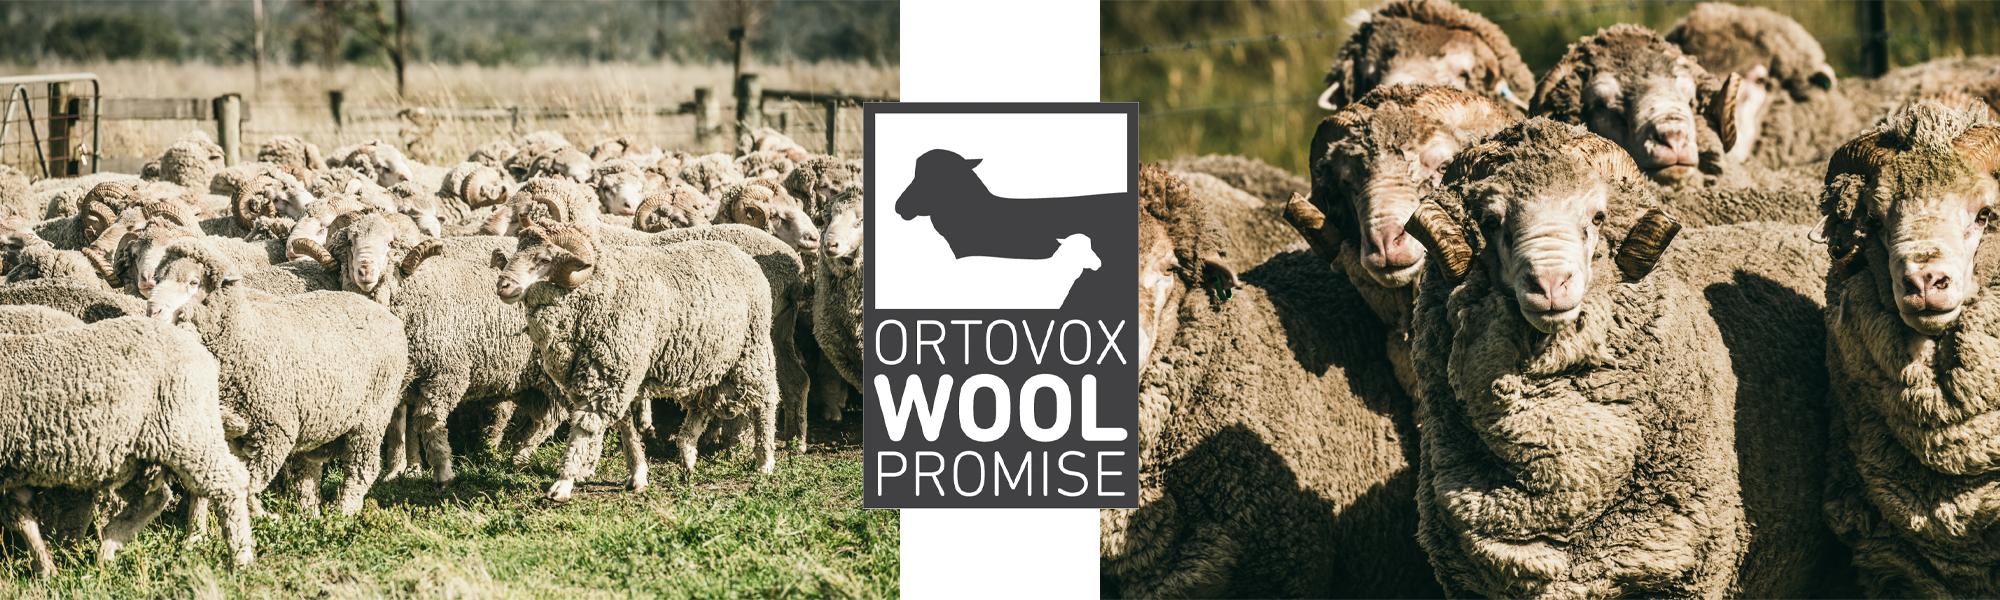 Ortovox Wool Promise